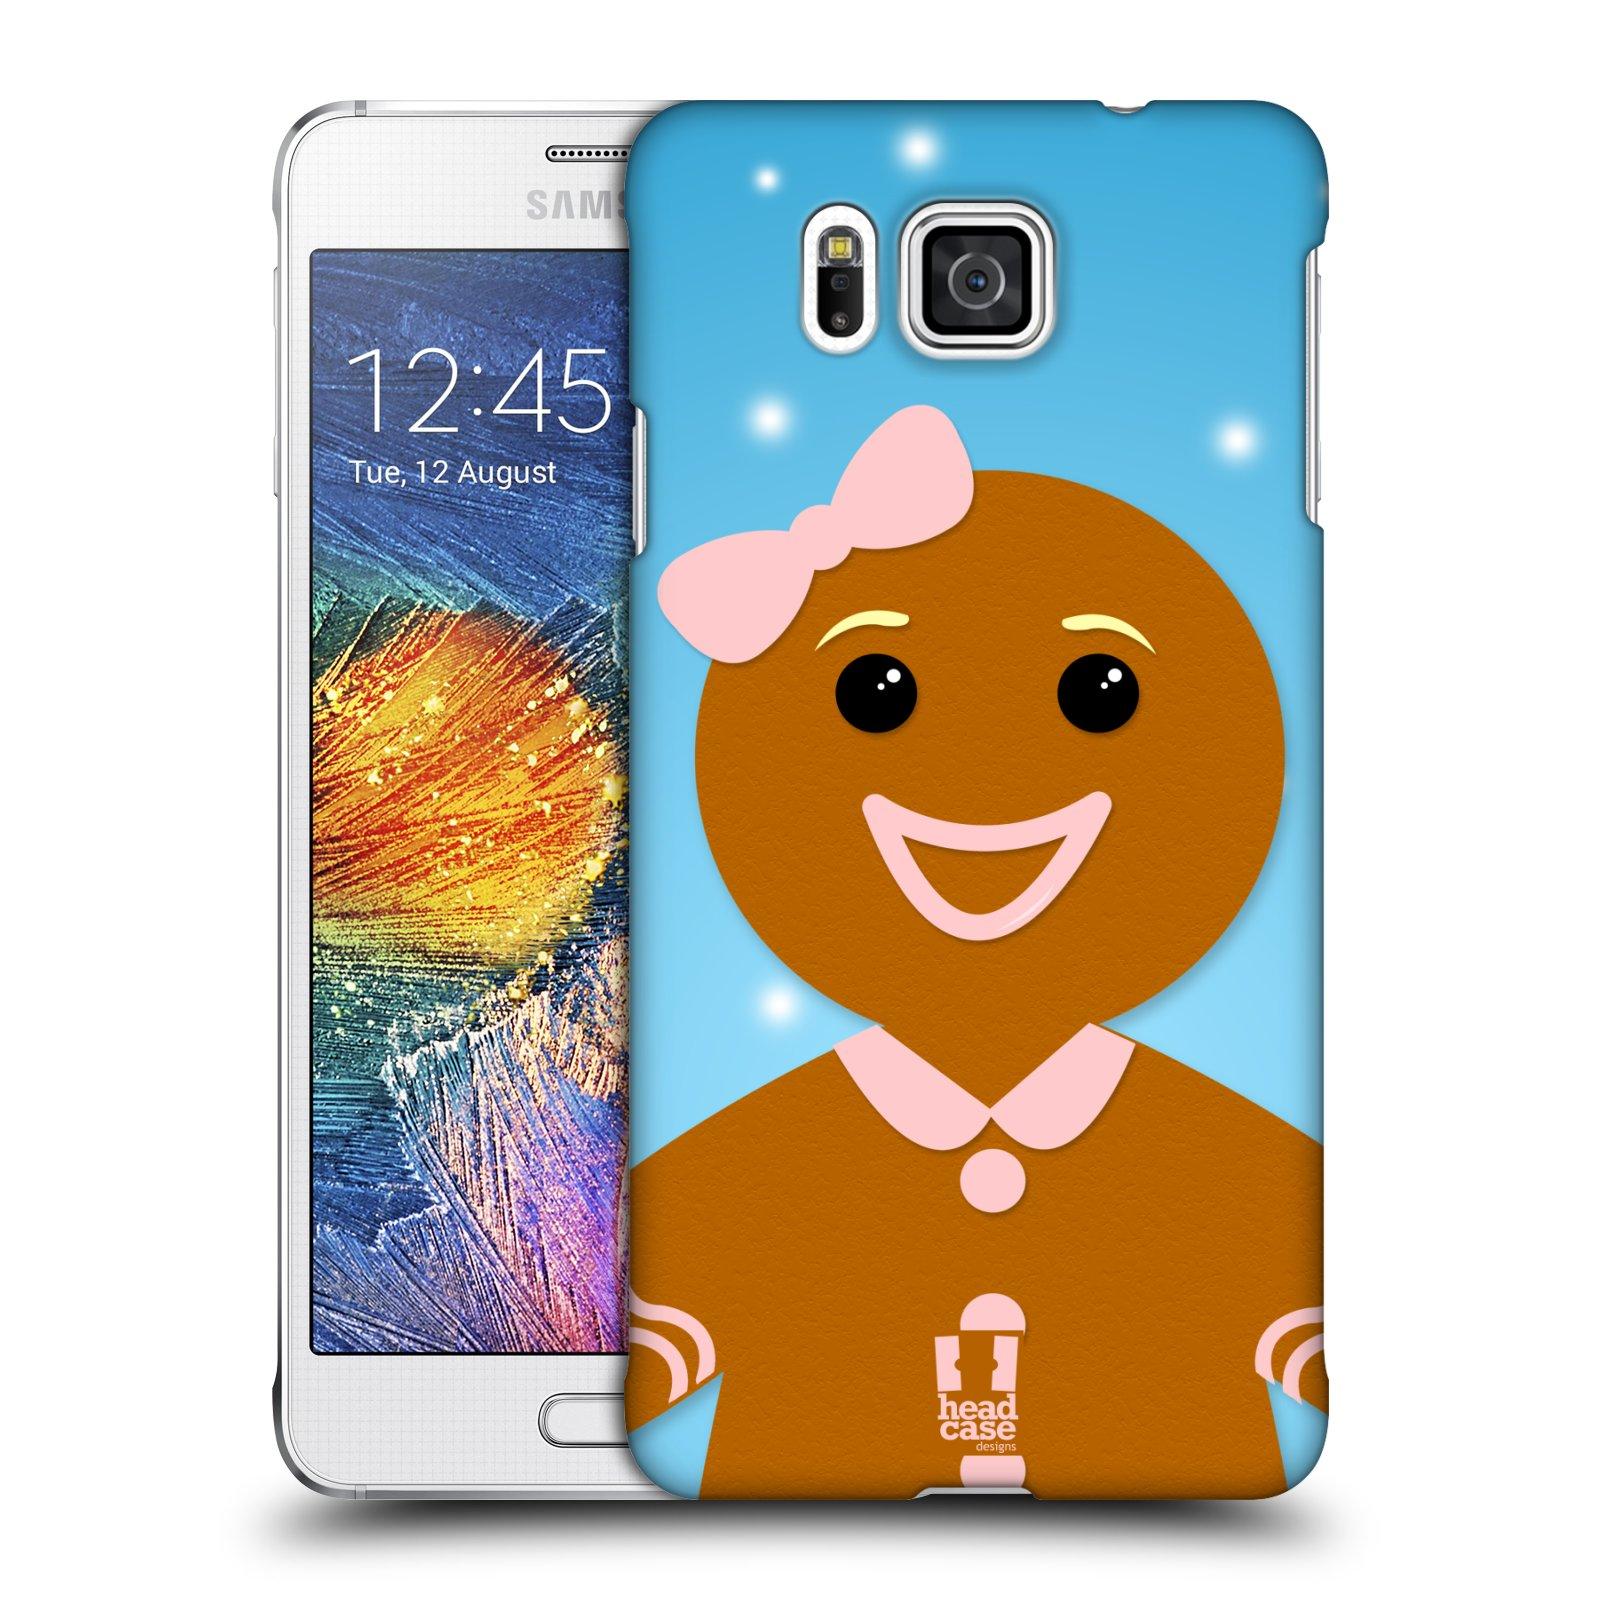 Plastové pouzdro na mobil Samsung Galaxy Alpha HEAD CASE VÁNOCE PERNÍČEK (Kryt či obal na mobilní telefon Samsung Galaxy Alpha SM-G850)